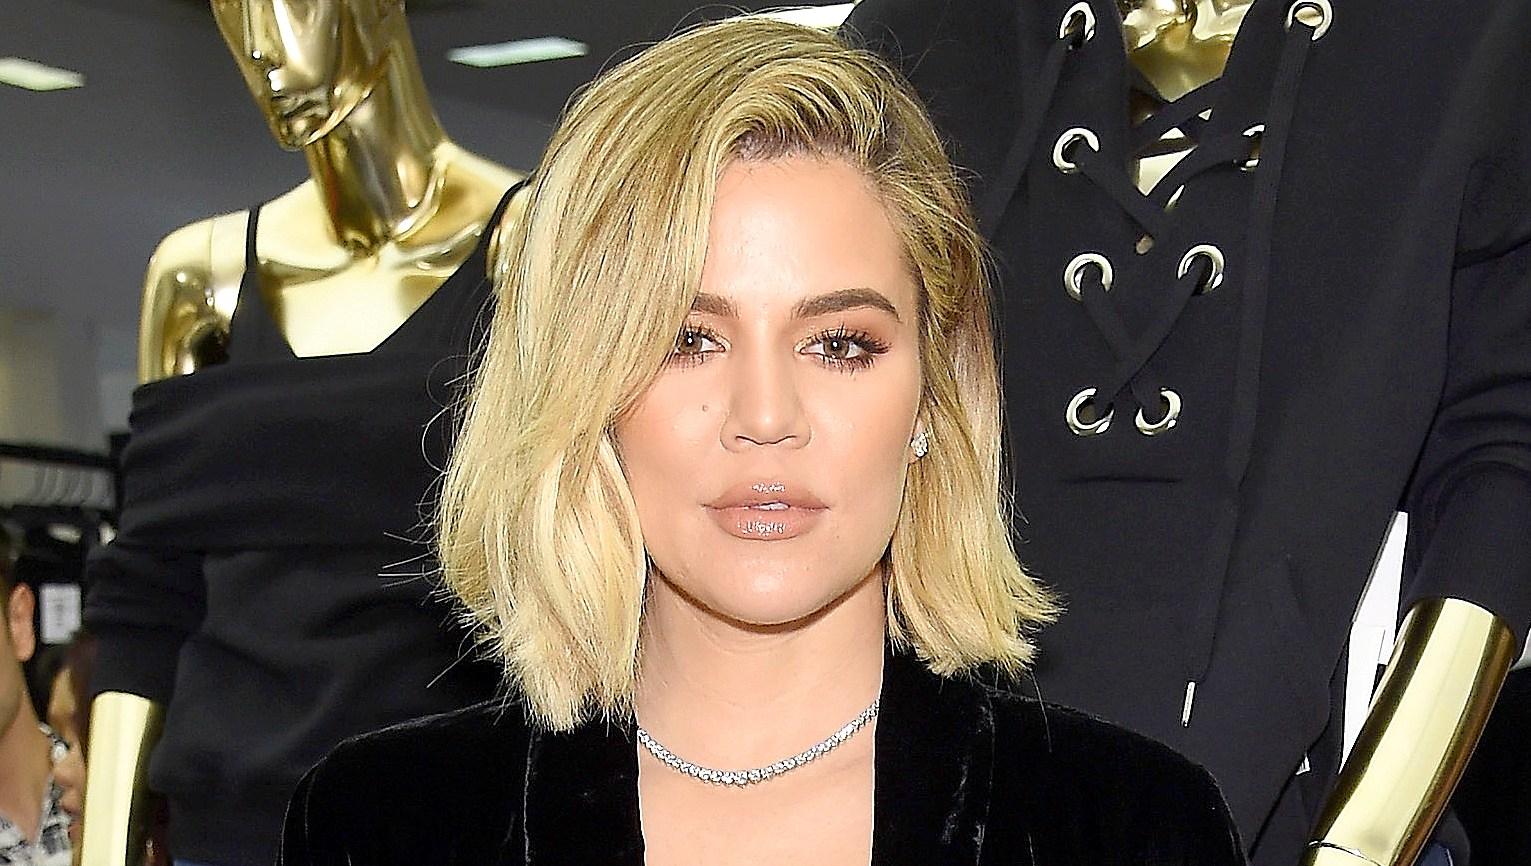 Khloe-Kardashian-dating-advice-2